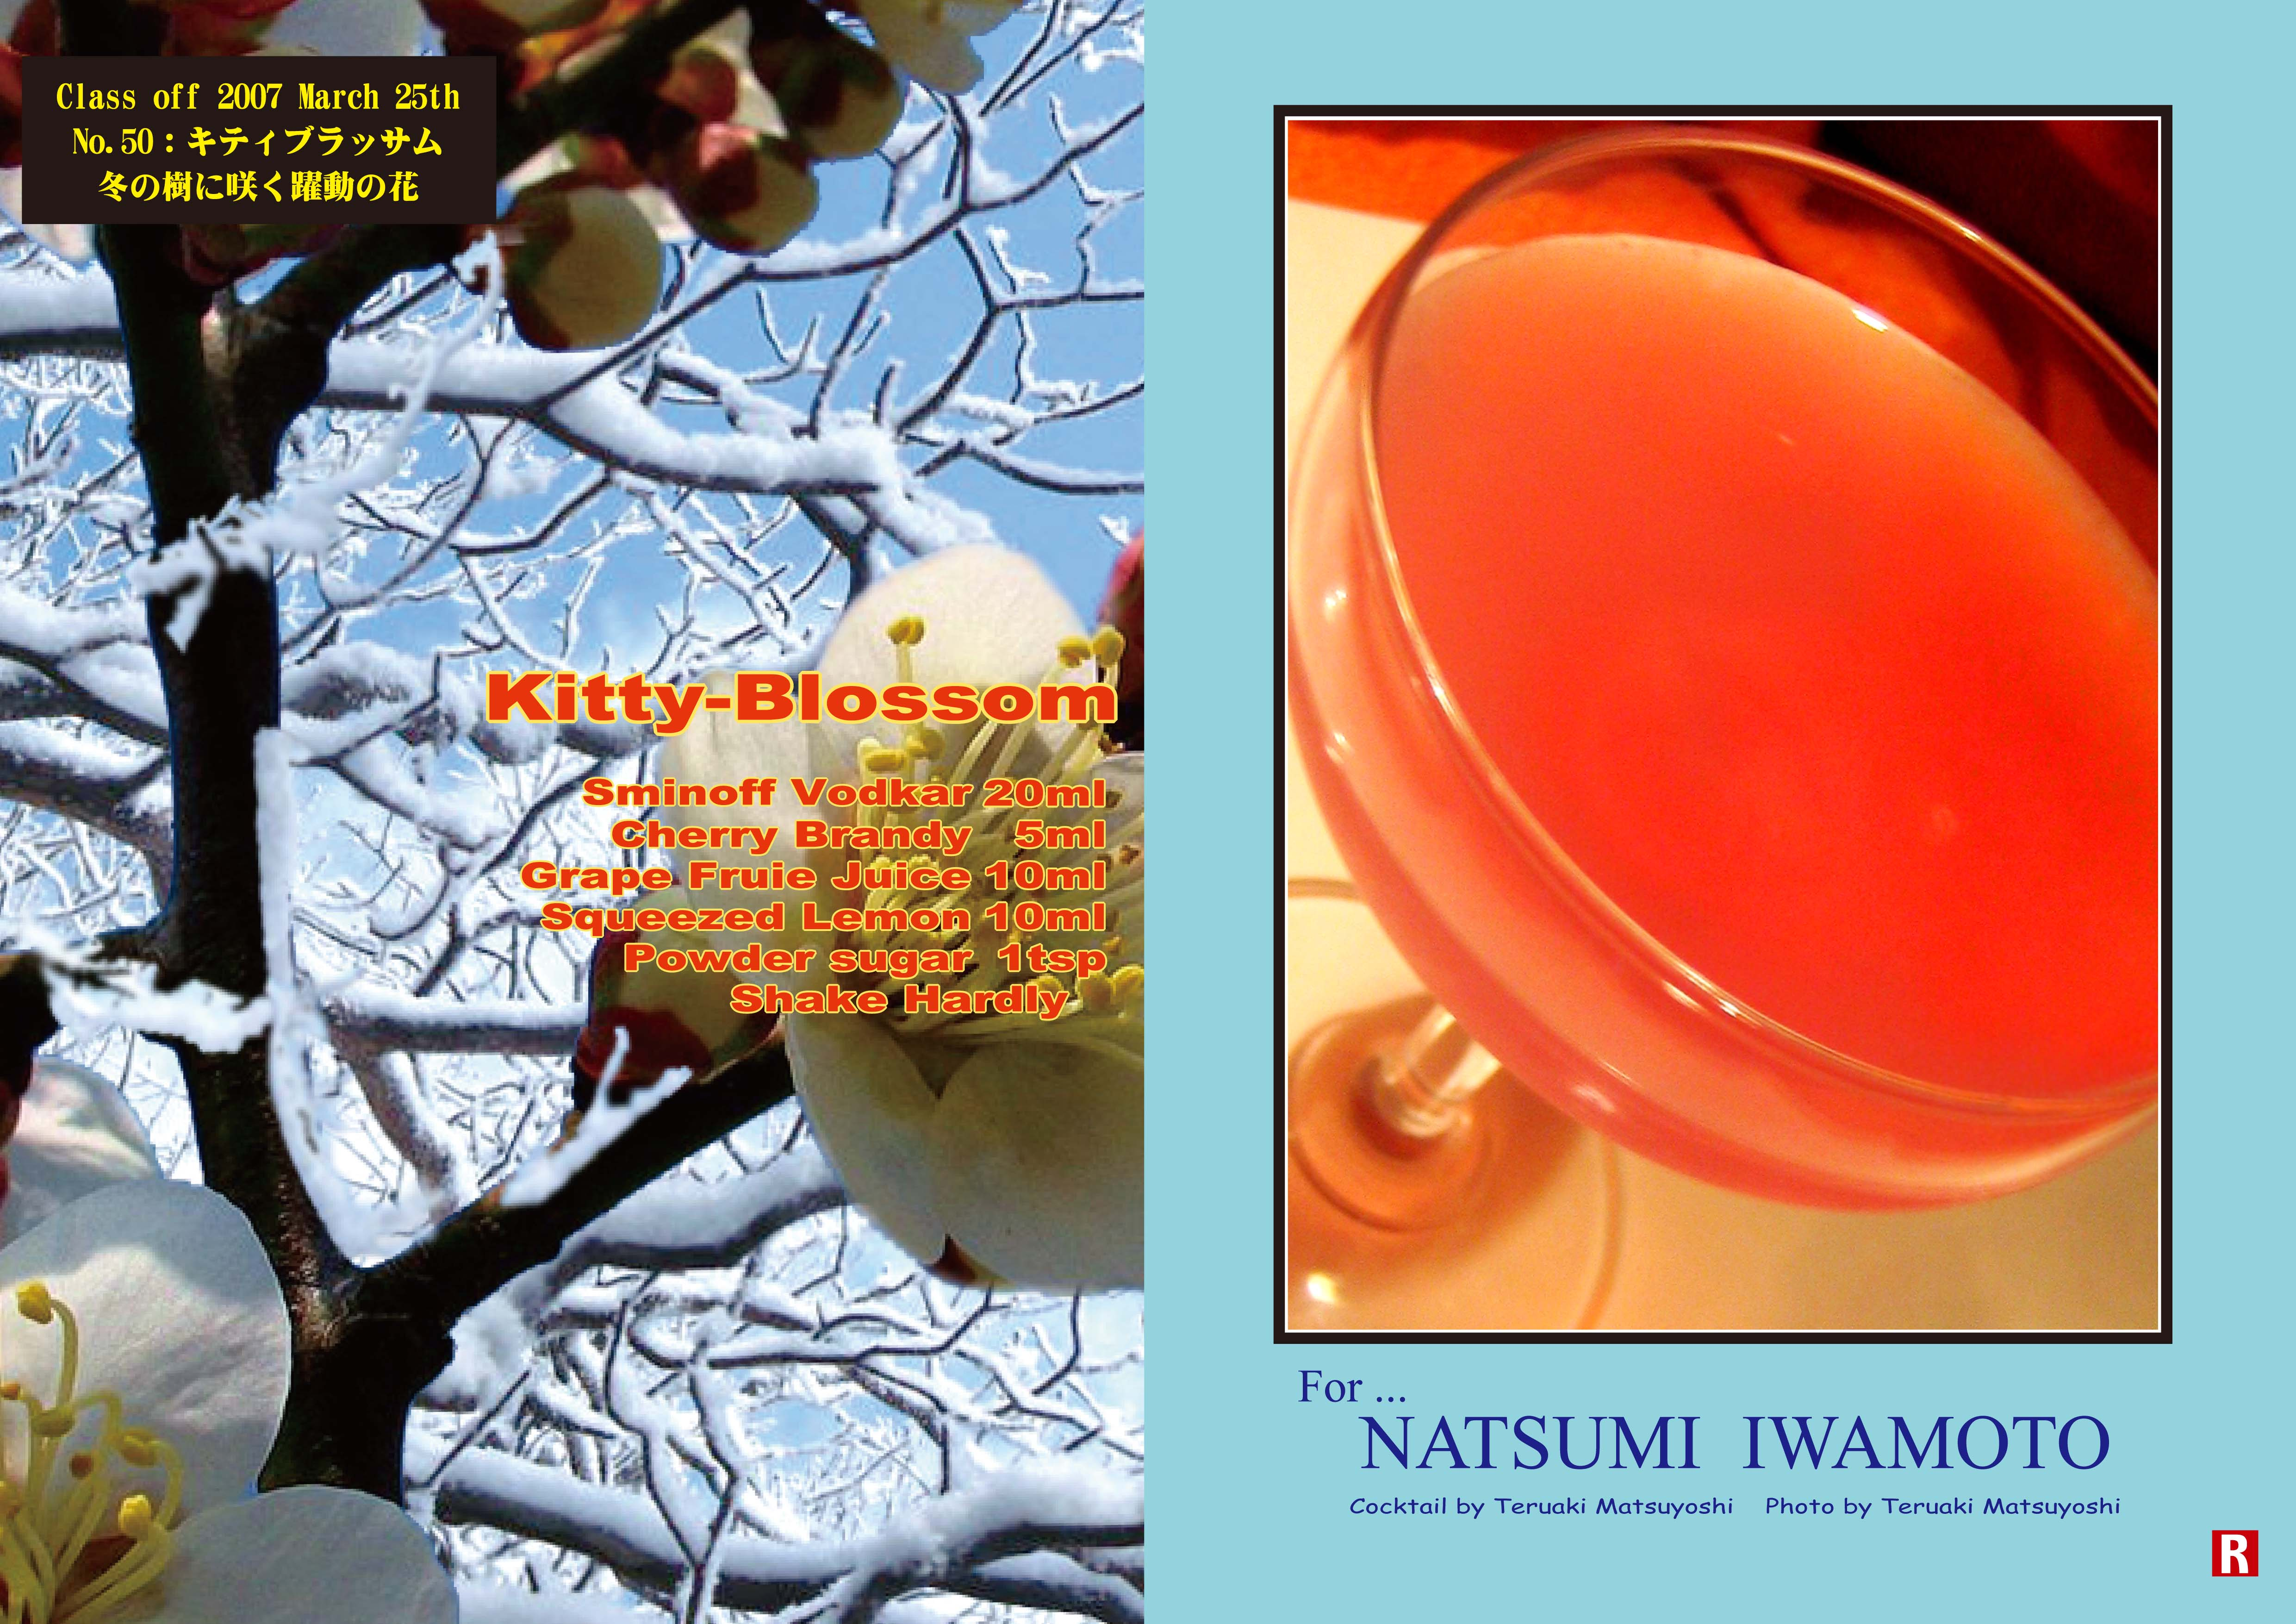 200703Natsumi-Iwamoto_Kitty-Blossom